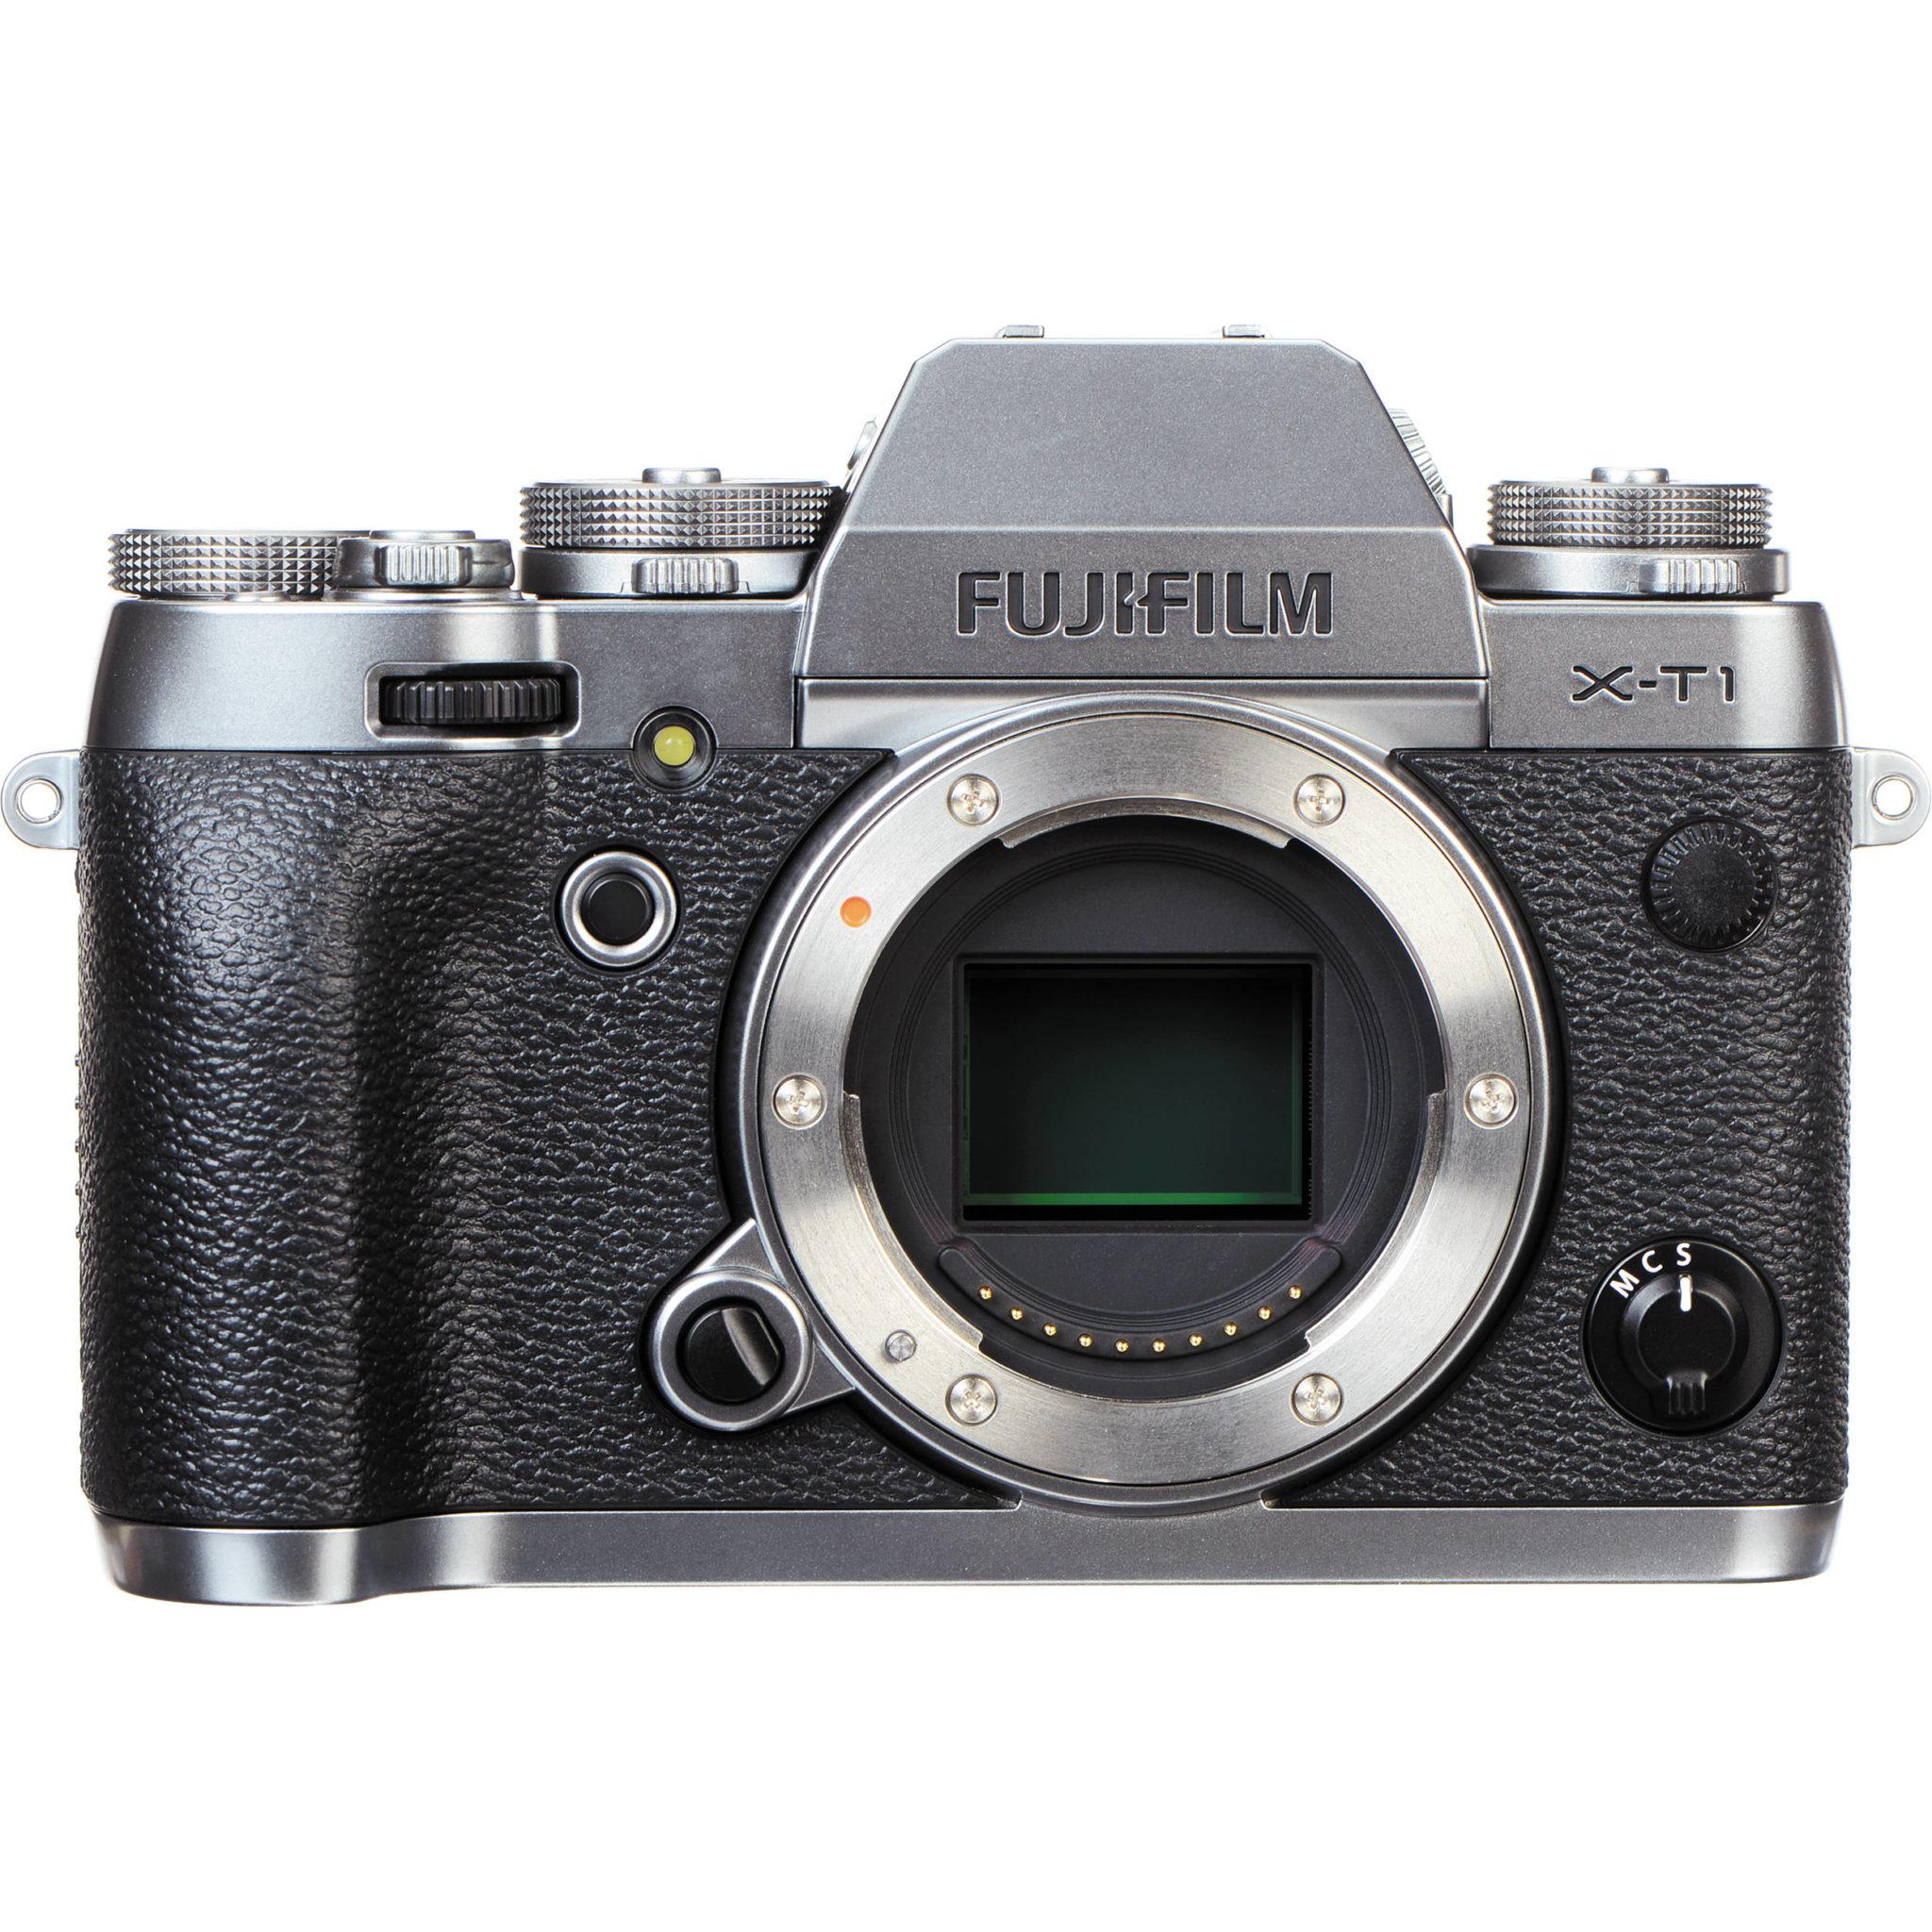 Fujifilm XT1 in Pakistan